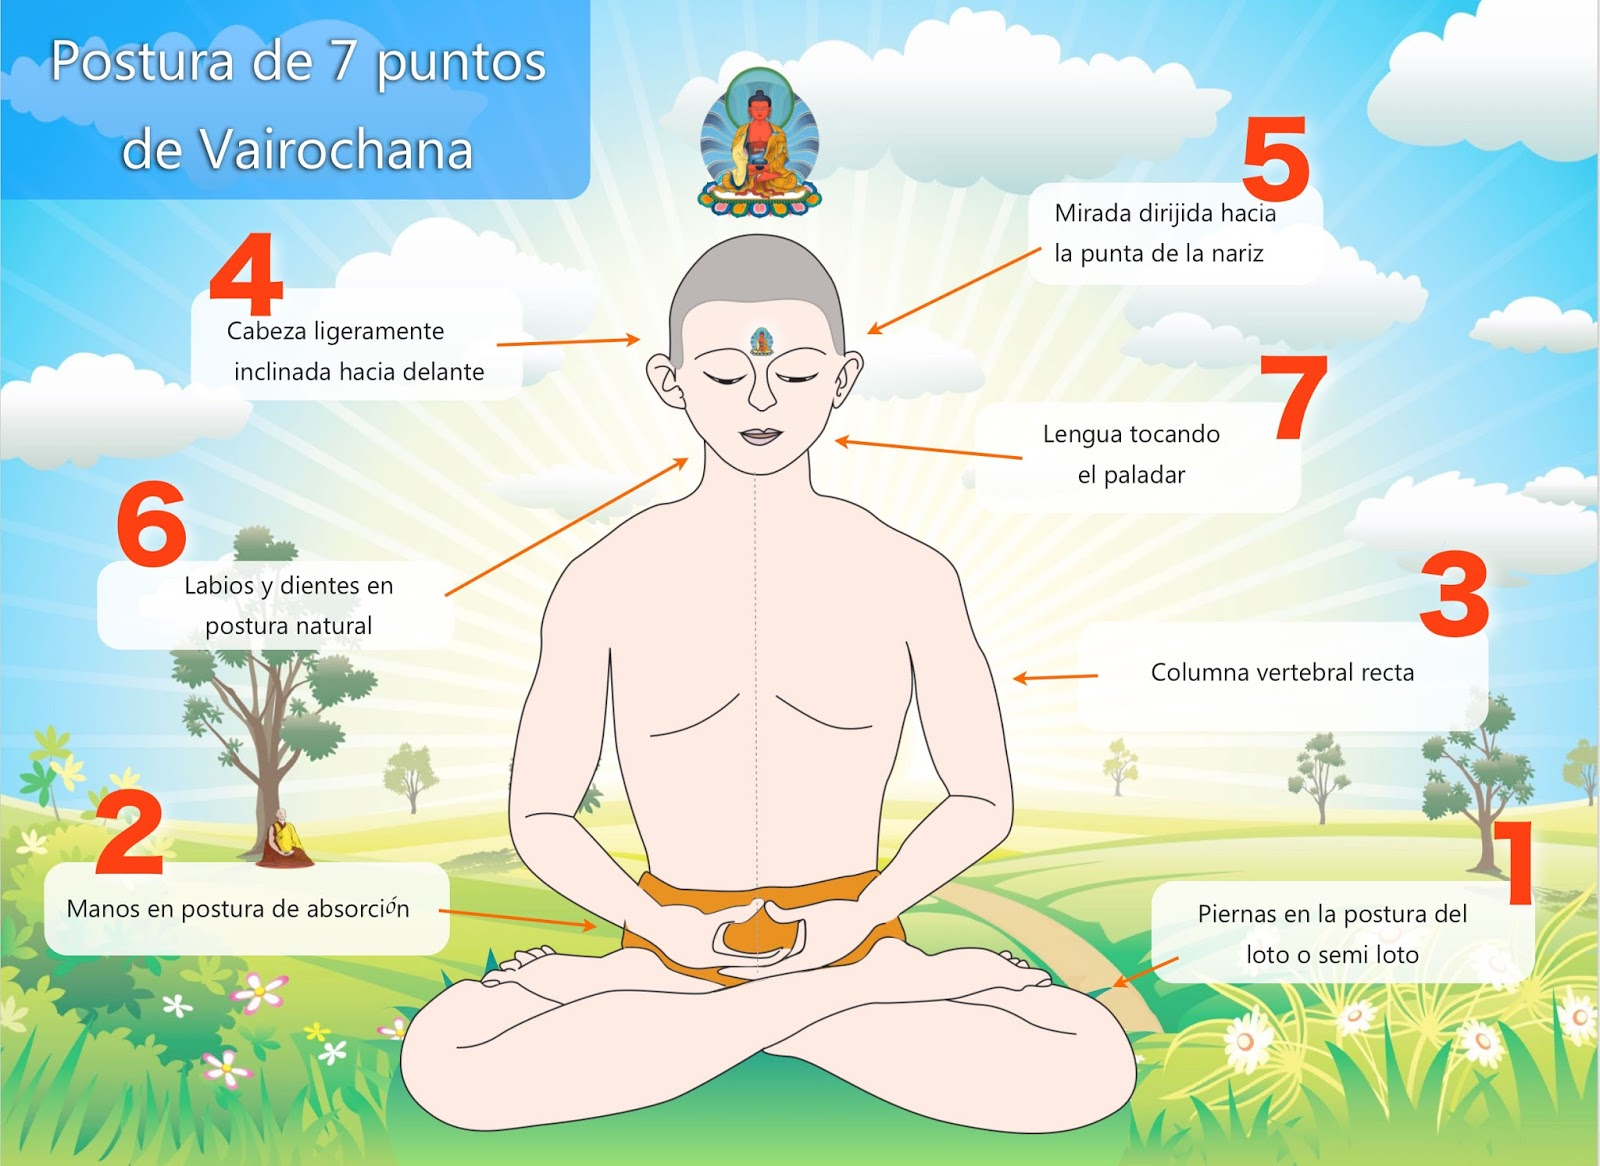 postura de los siete puntos de Vairochana